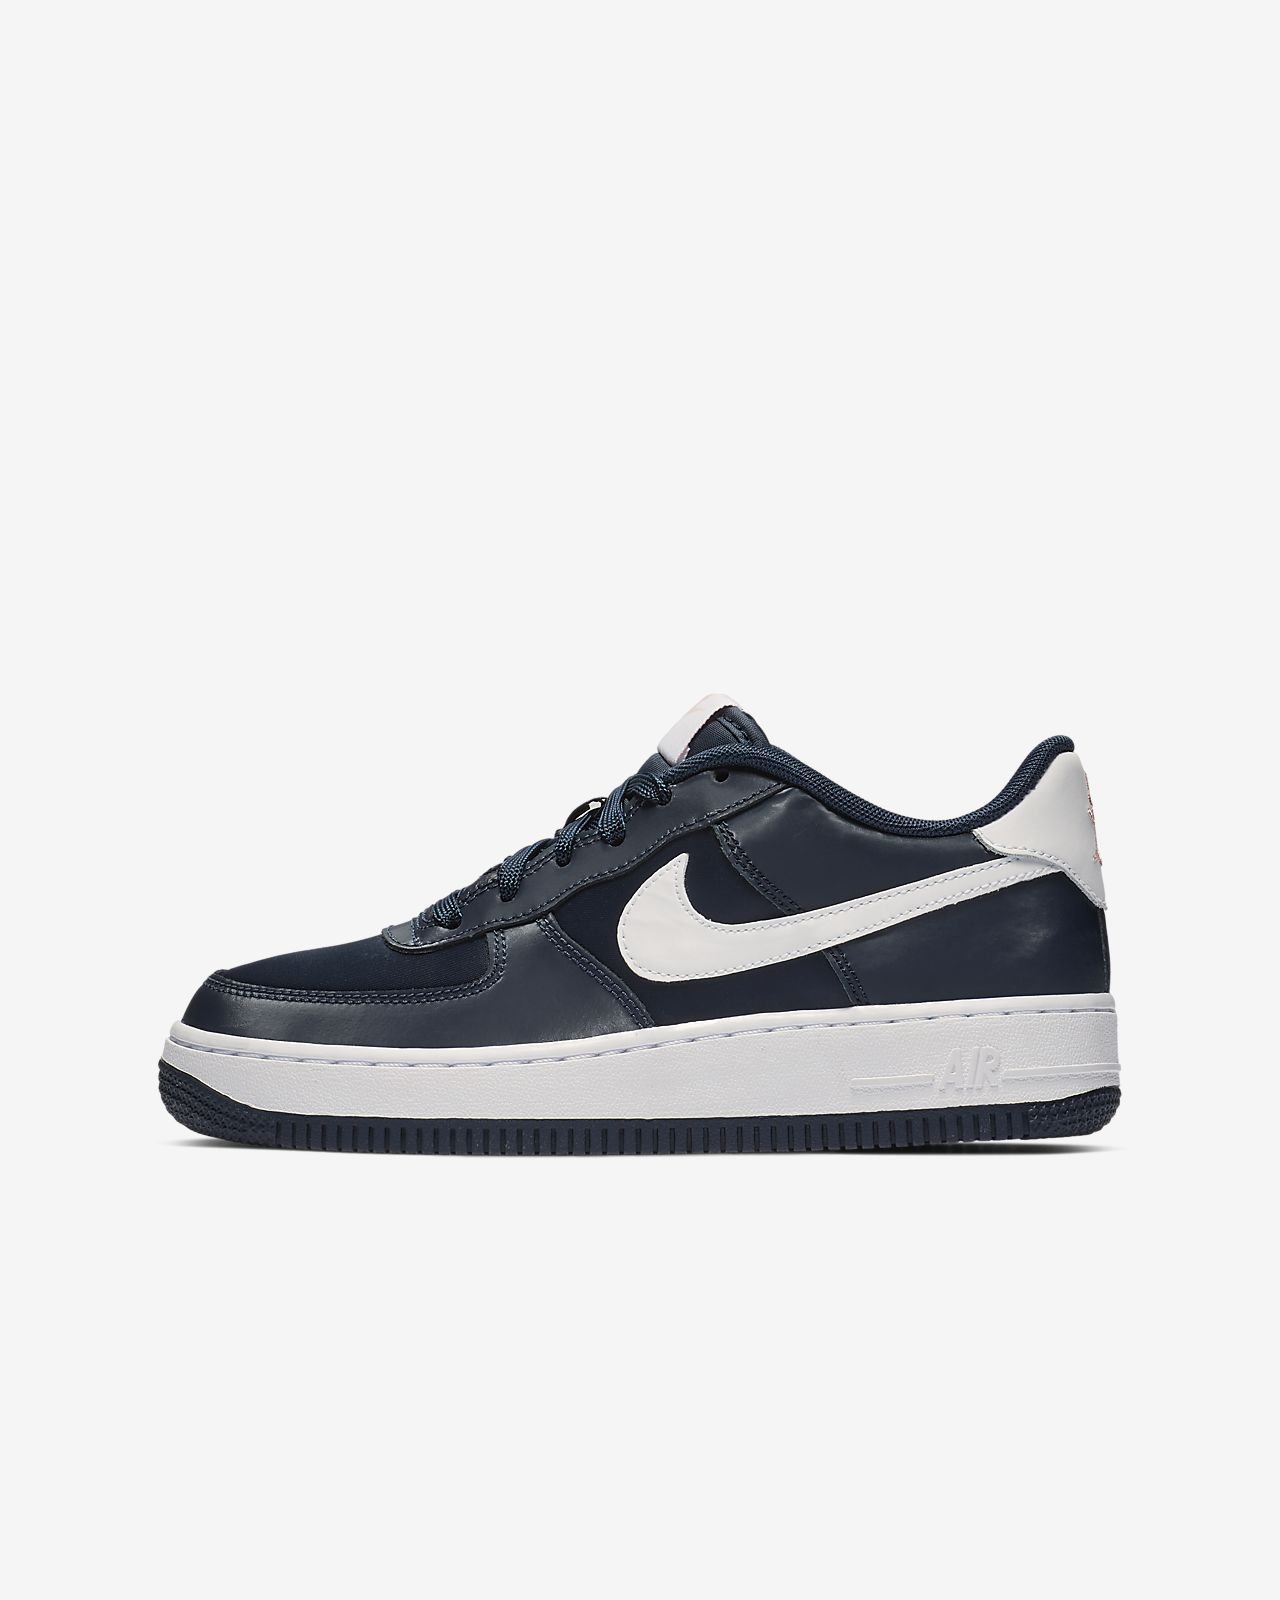 bcf5e4c0dce Nike Air Force 1 VDAY Kinderschoen. Nike.com BE